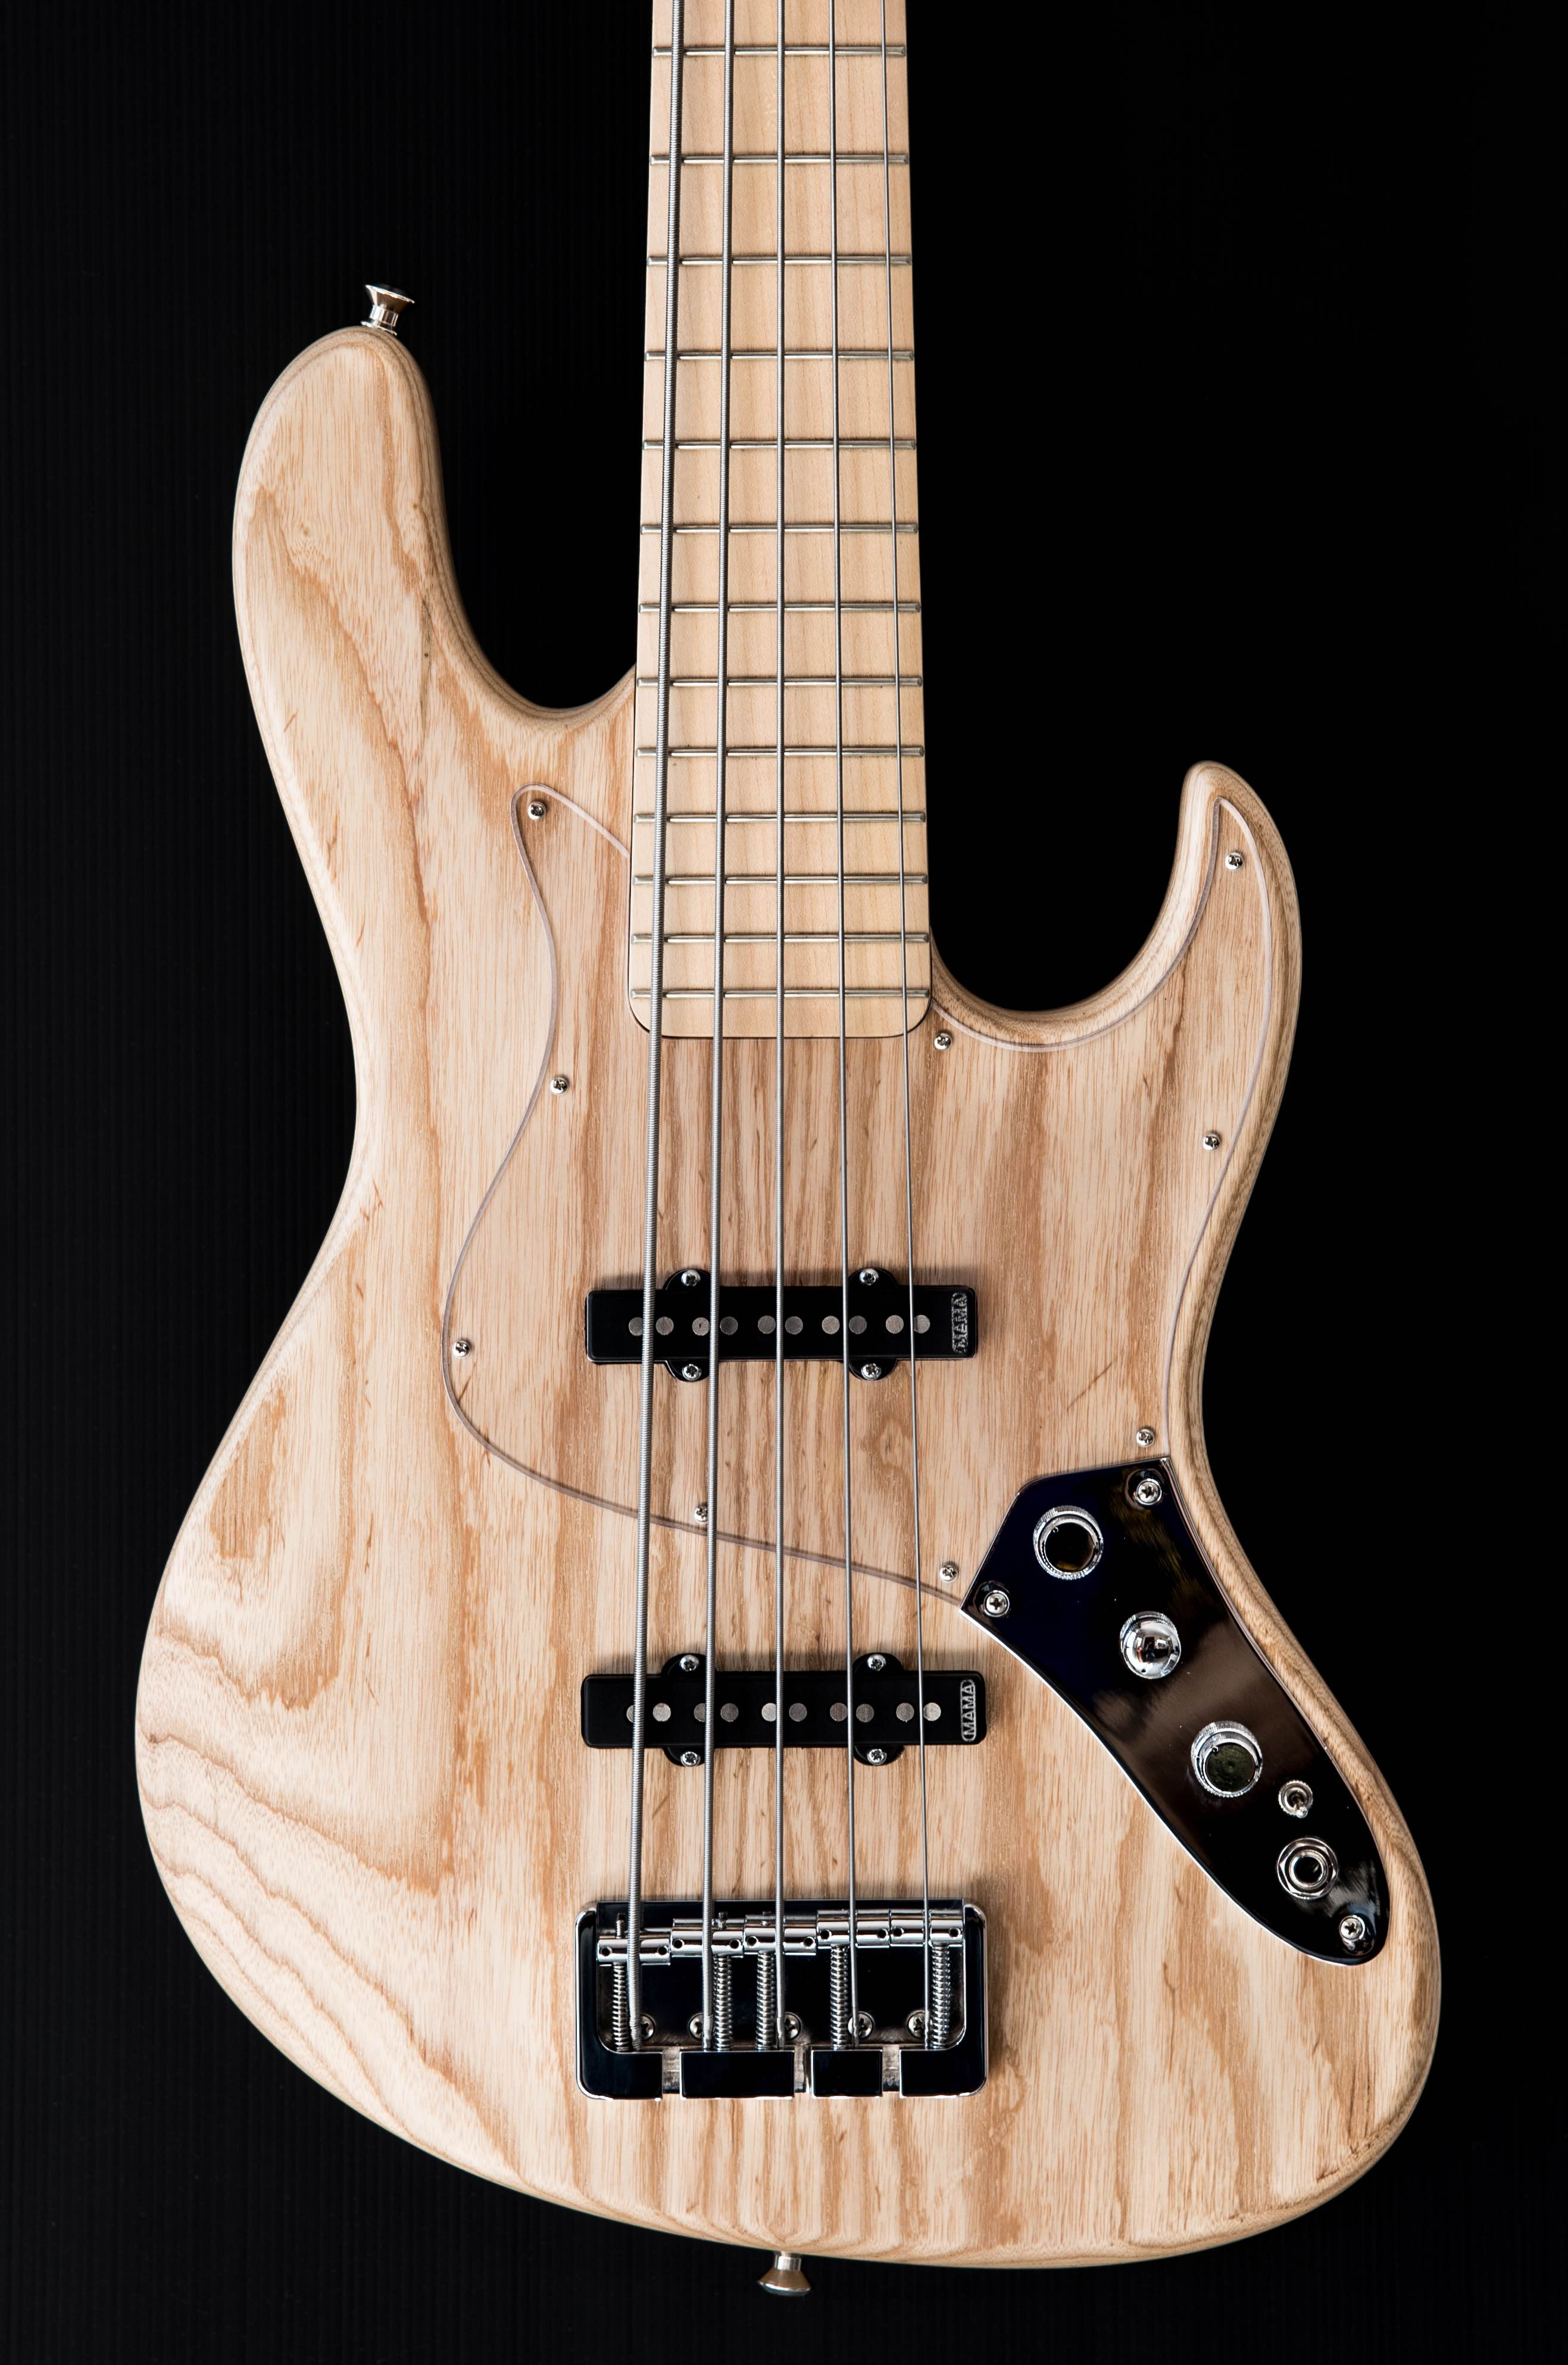 Vinta 5 strings swamp ash body